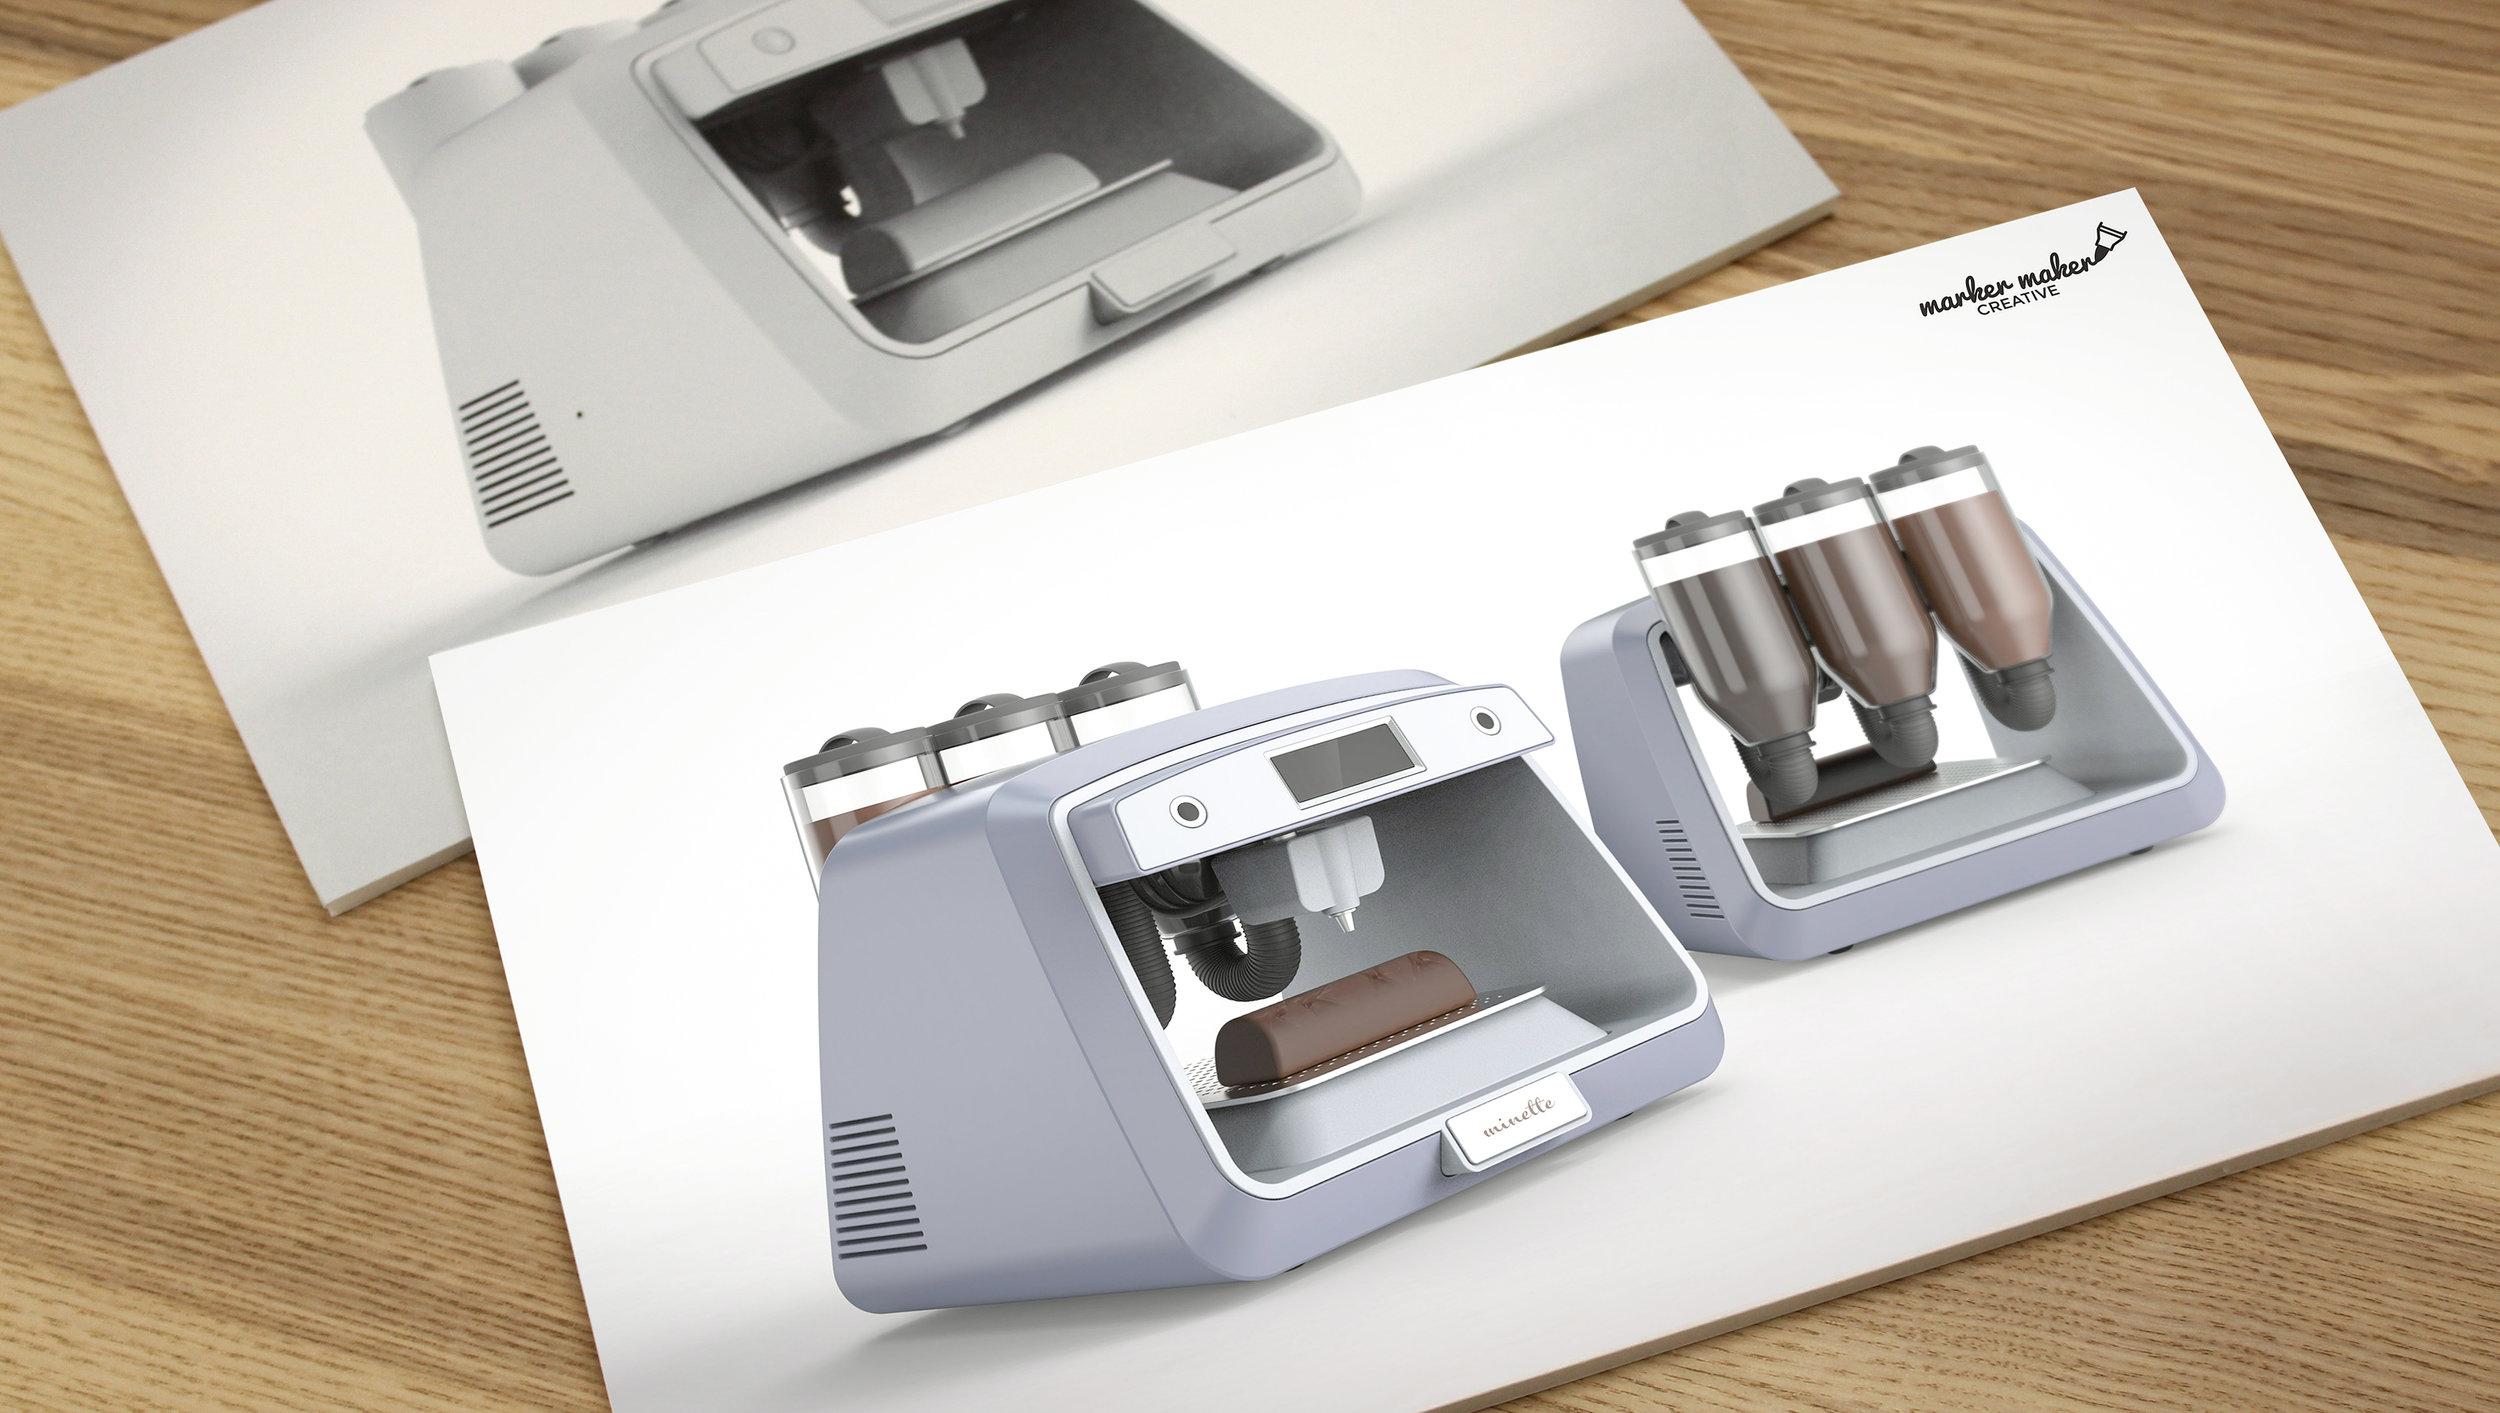 Photorealistic Rendering - Industrial design concept